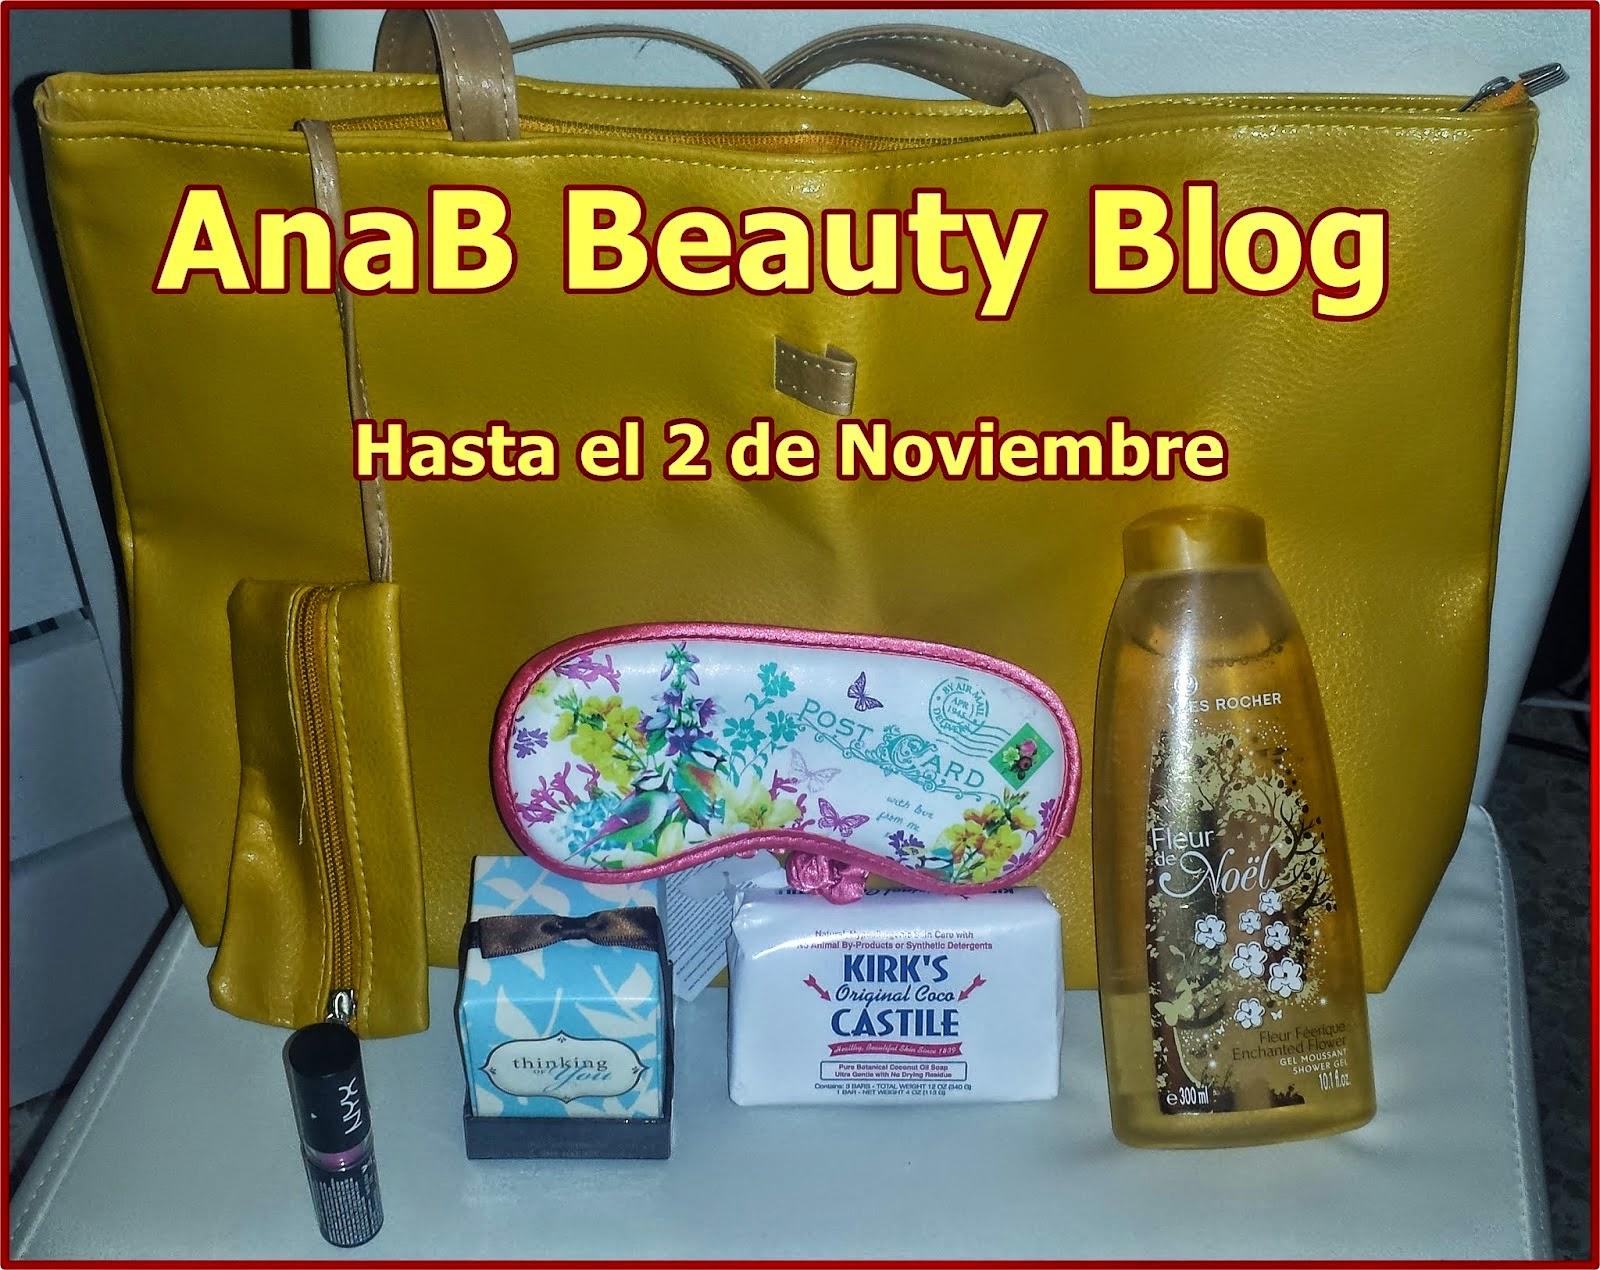 AnaBBeauty